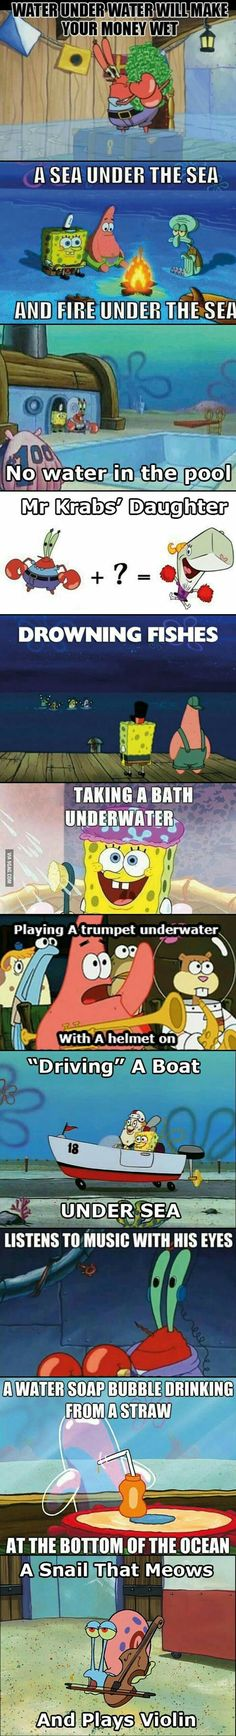 The logic of Spongebob